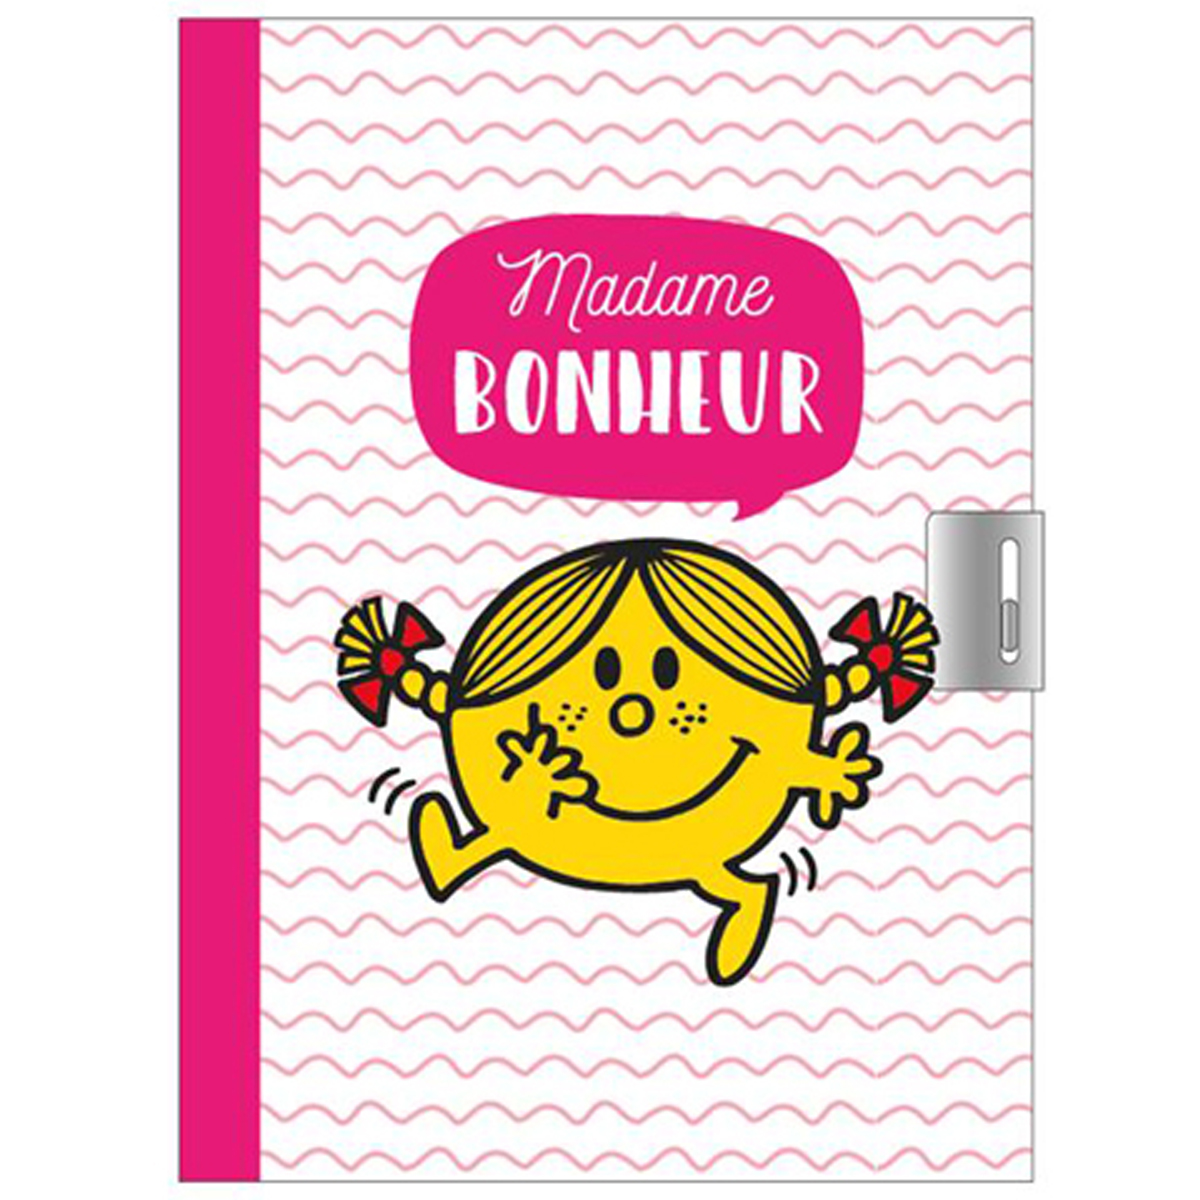 Journal Intime \'Monsieur Madame\' rose (Mme Bonheur) - 17x125 cm - [Q9302]